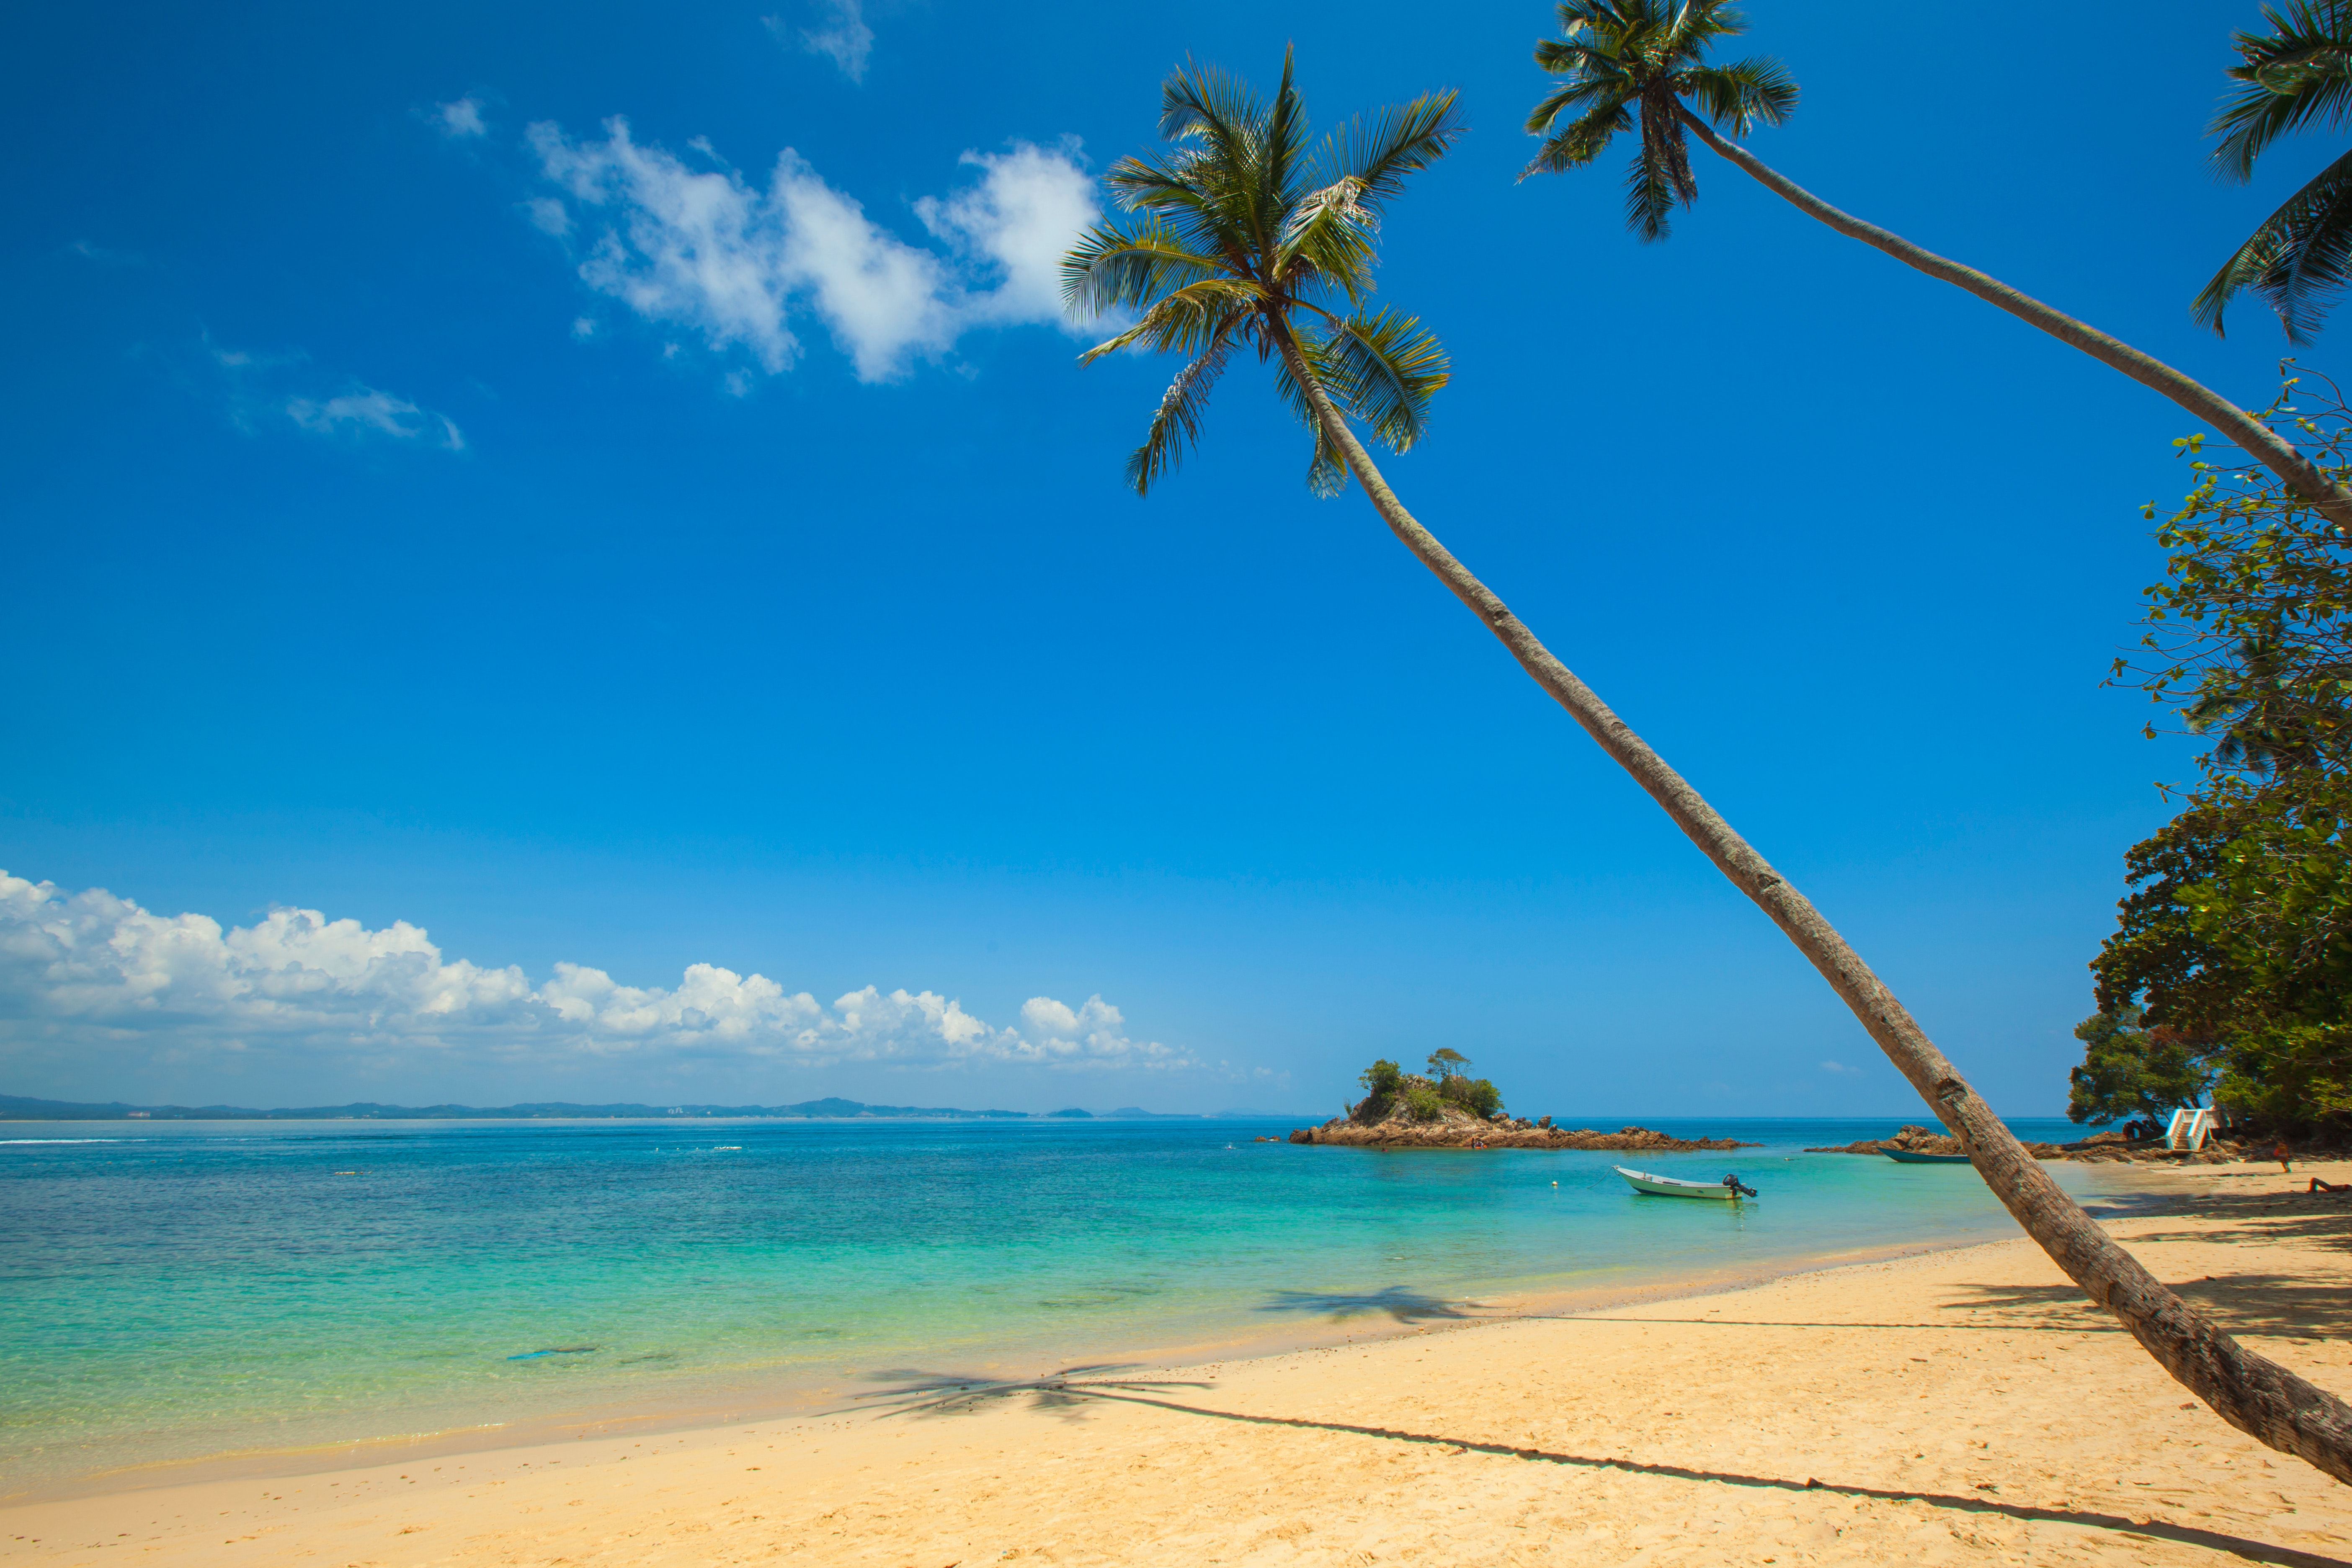 Green Coconut Palm Beside Seashore Under Blue Calm Sky during Daytime, Beach, Blue sky, Boat, Island, HQ Photo